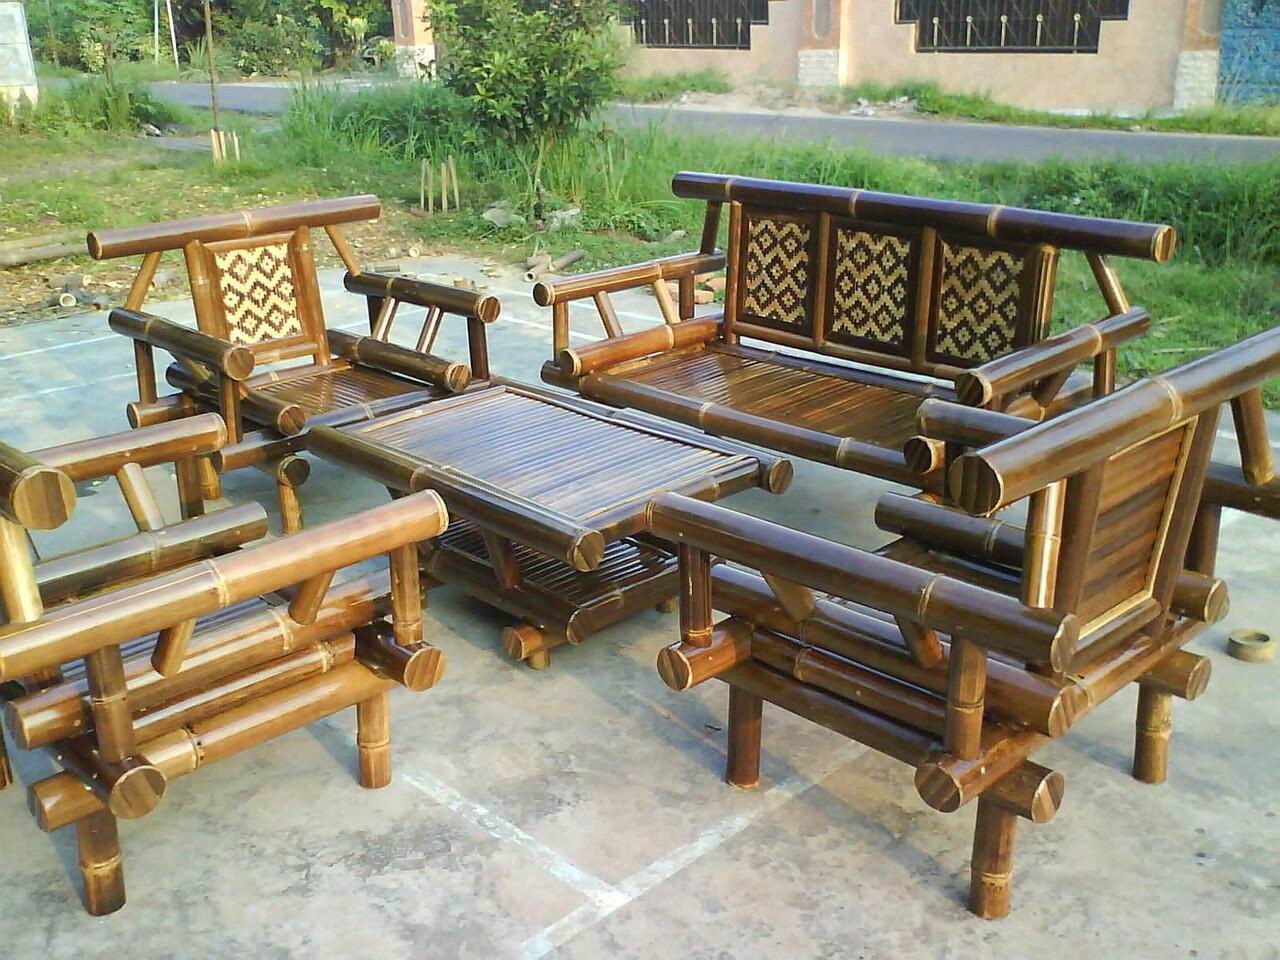 57+ Gambar Meja Kursi Dari Bambu Terbaik